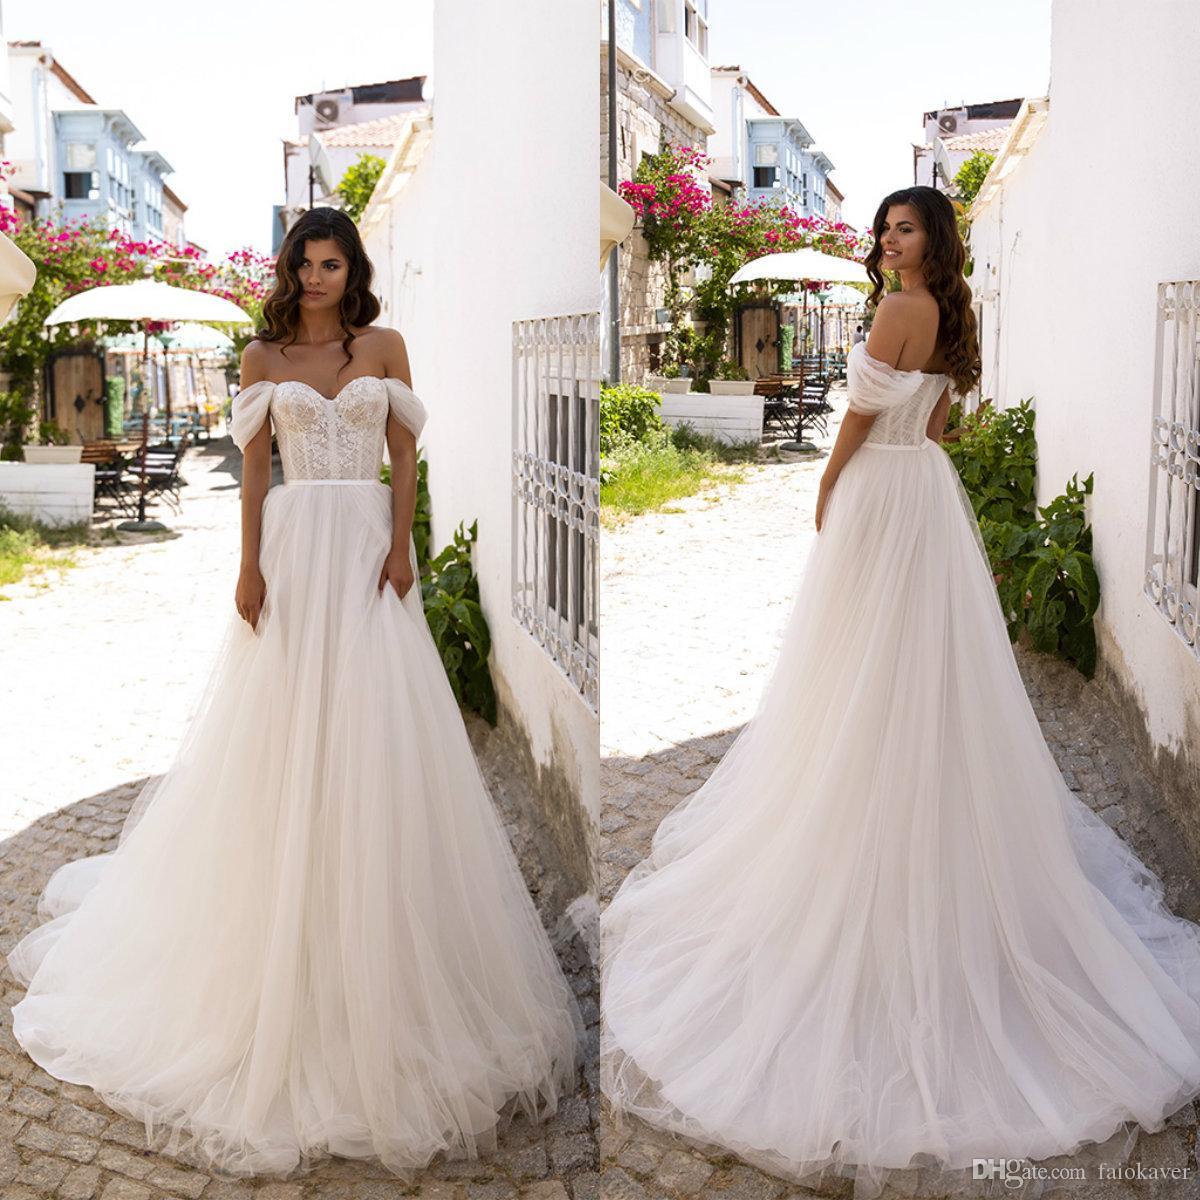 Oksana Mukha mariage de plage Robes Encolure dentelle Applique Une ligne Robe de mariée Boho Custom Made balayage train Pays Da Sposa Abiti